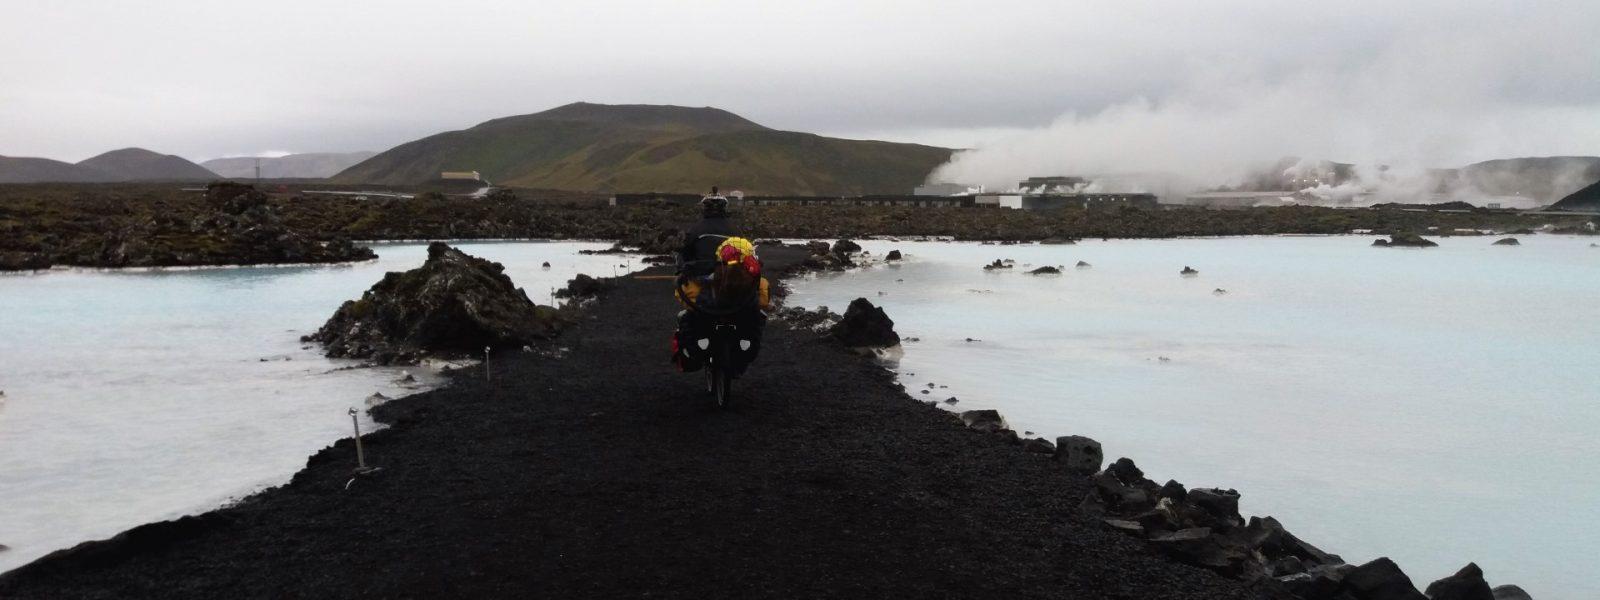 Iceland part 5: Ice